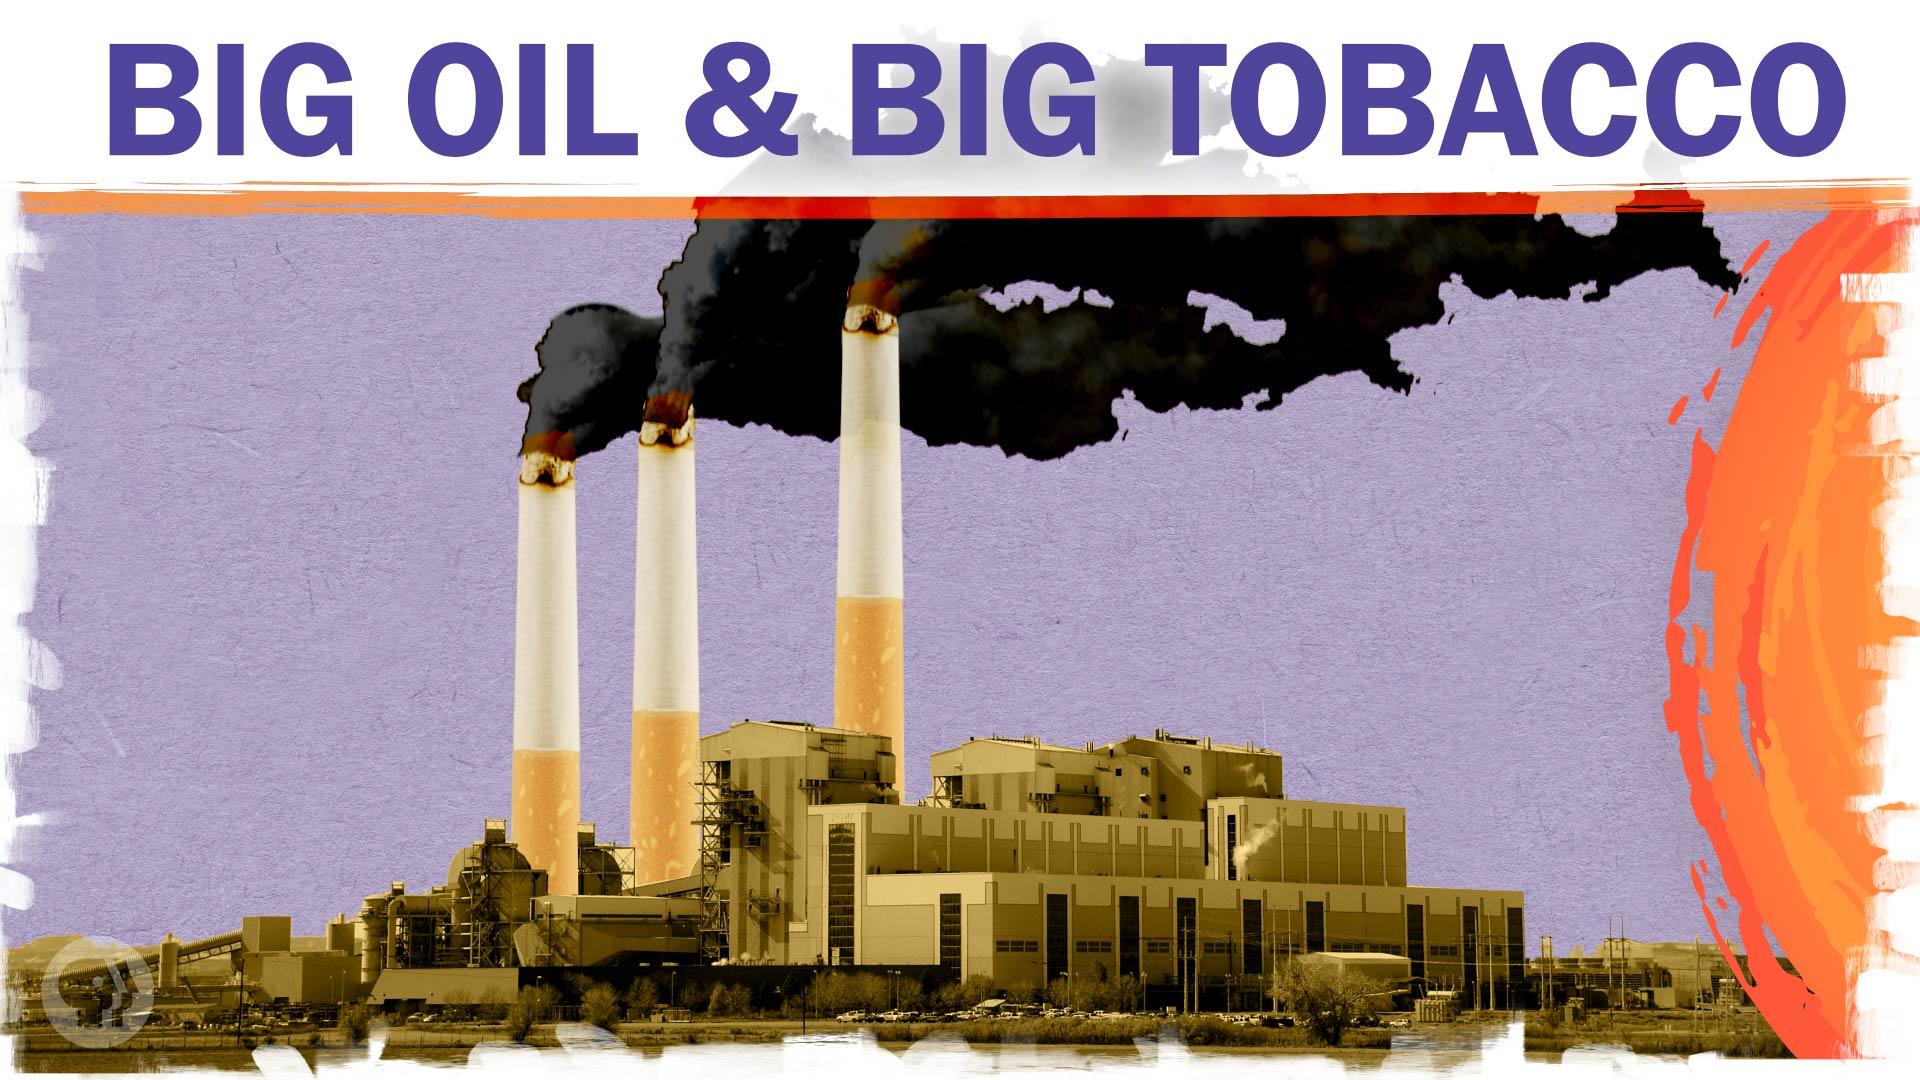 Hot Mess - 125 - Tobacco Climate TN.jpg